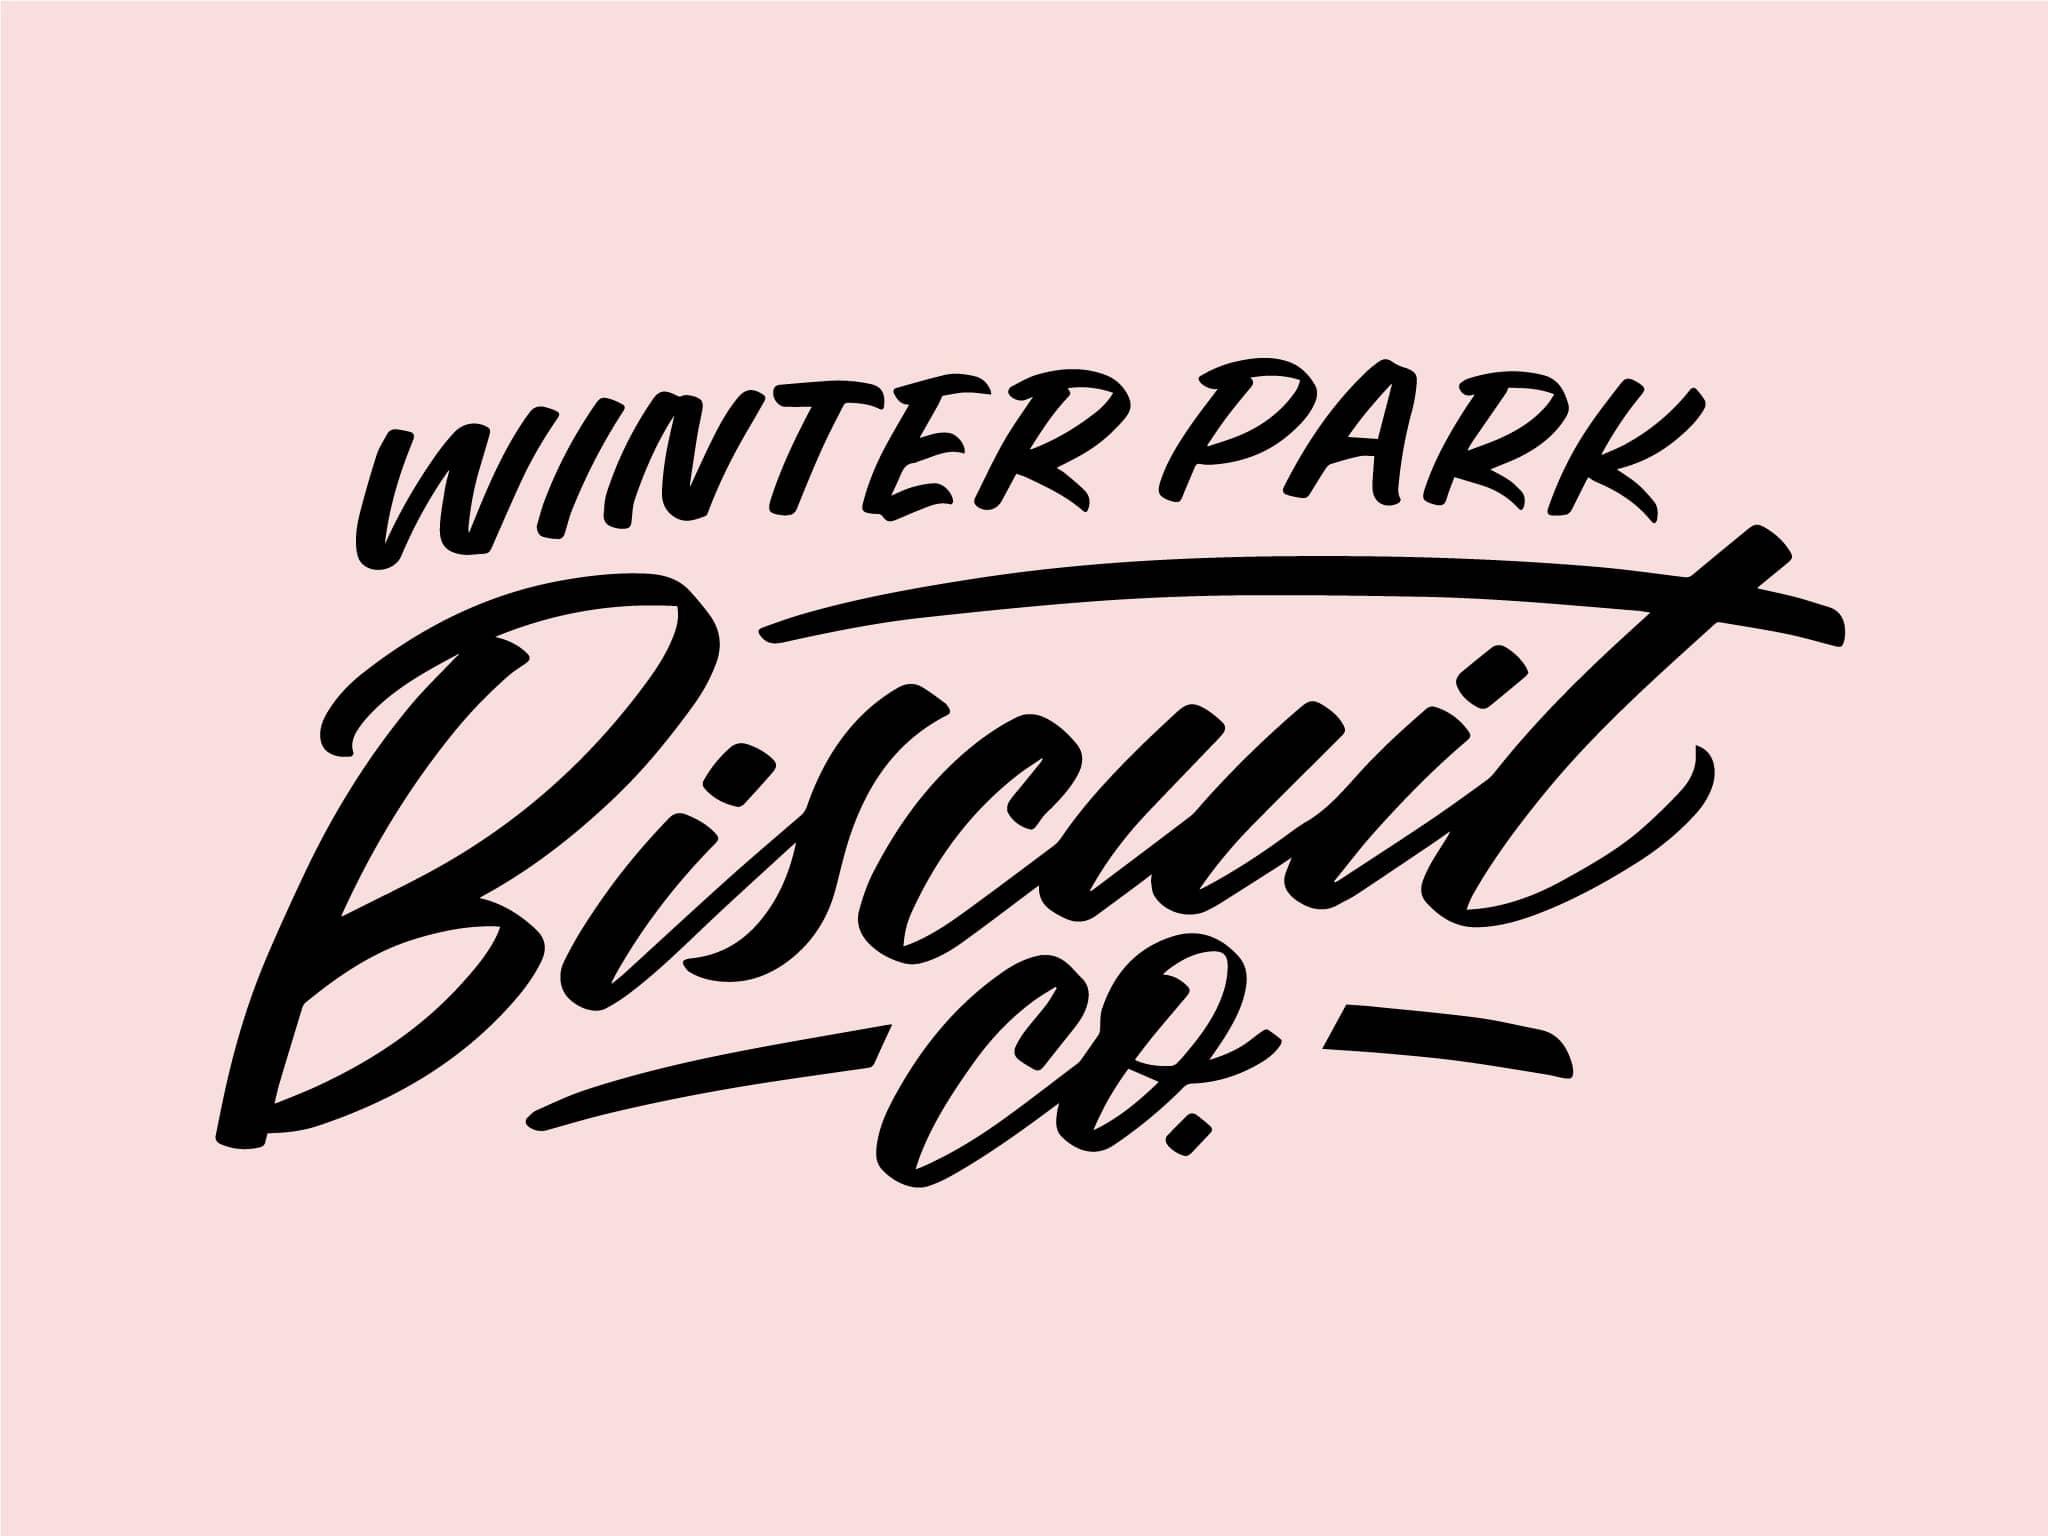 Winter Park Biscuit Co. hand lettered brush lettering logo